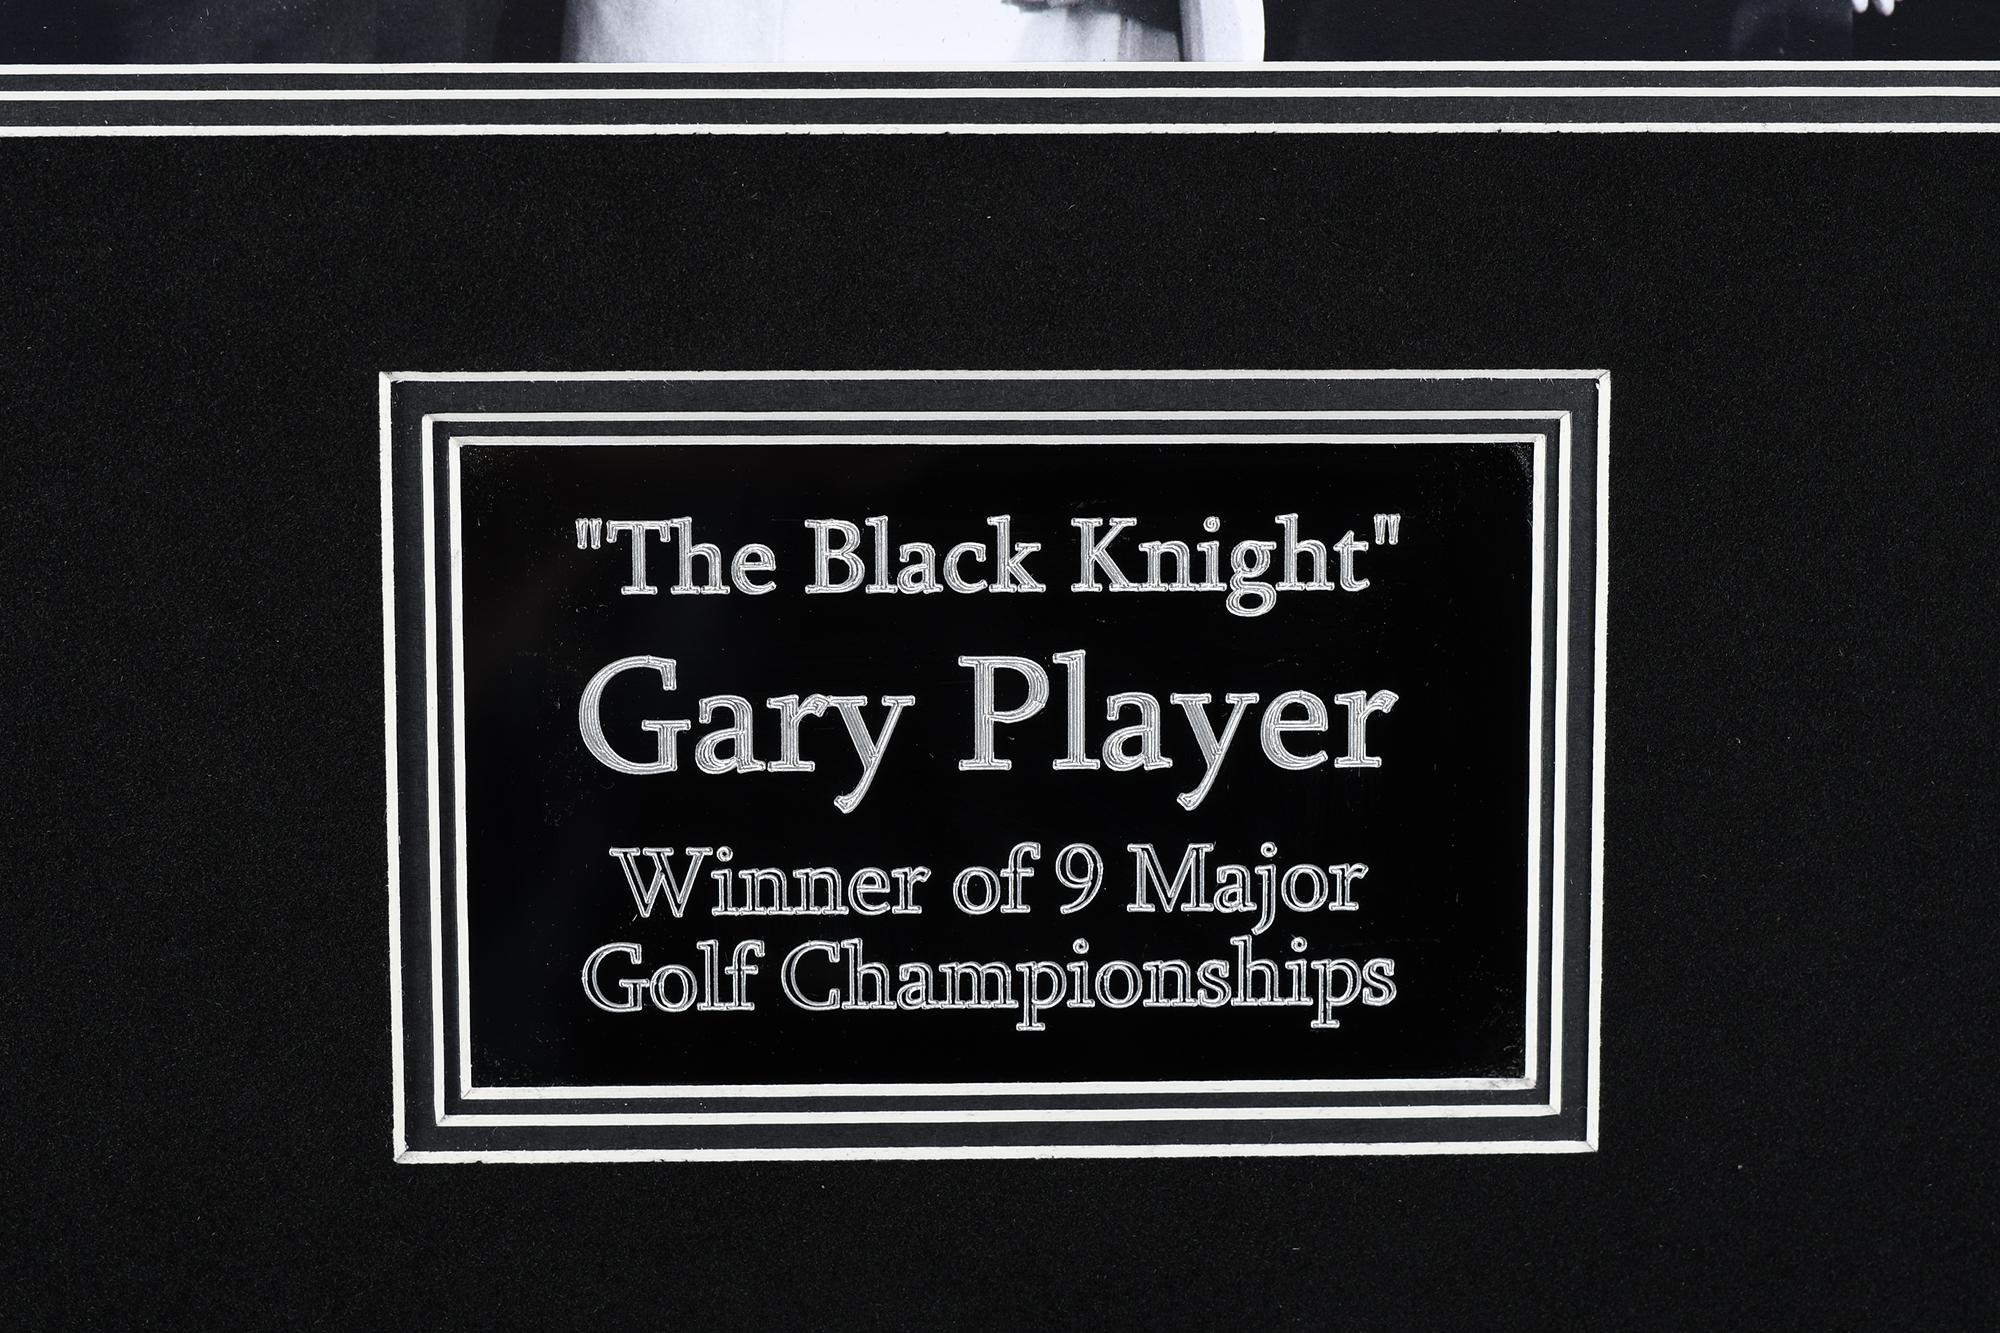 GARY PLAYER SIGNATURE PRESENTATION - Image 2 of 6